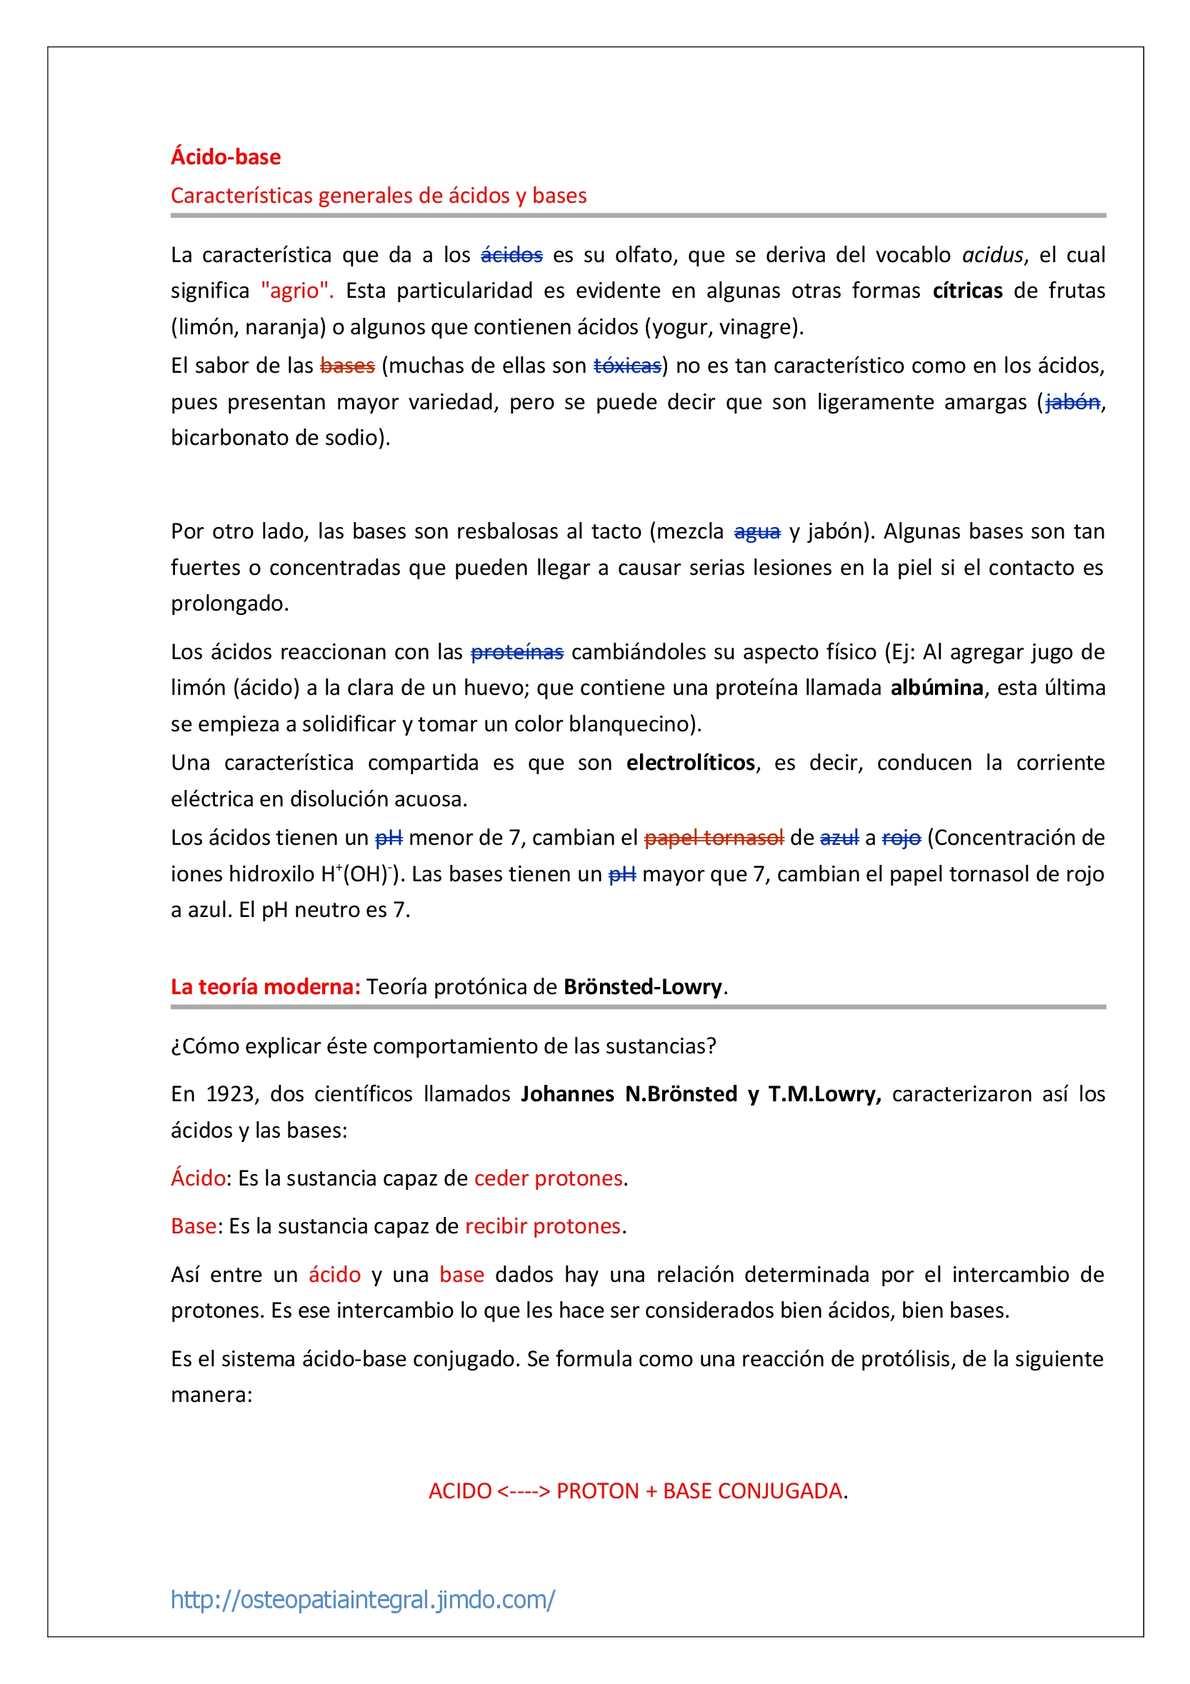 Calaméo - OSTEOPATIA INTEGRAL tomo IV